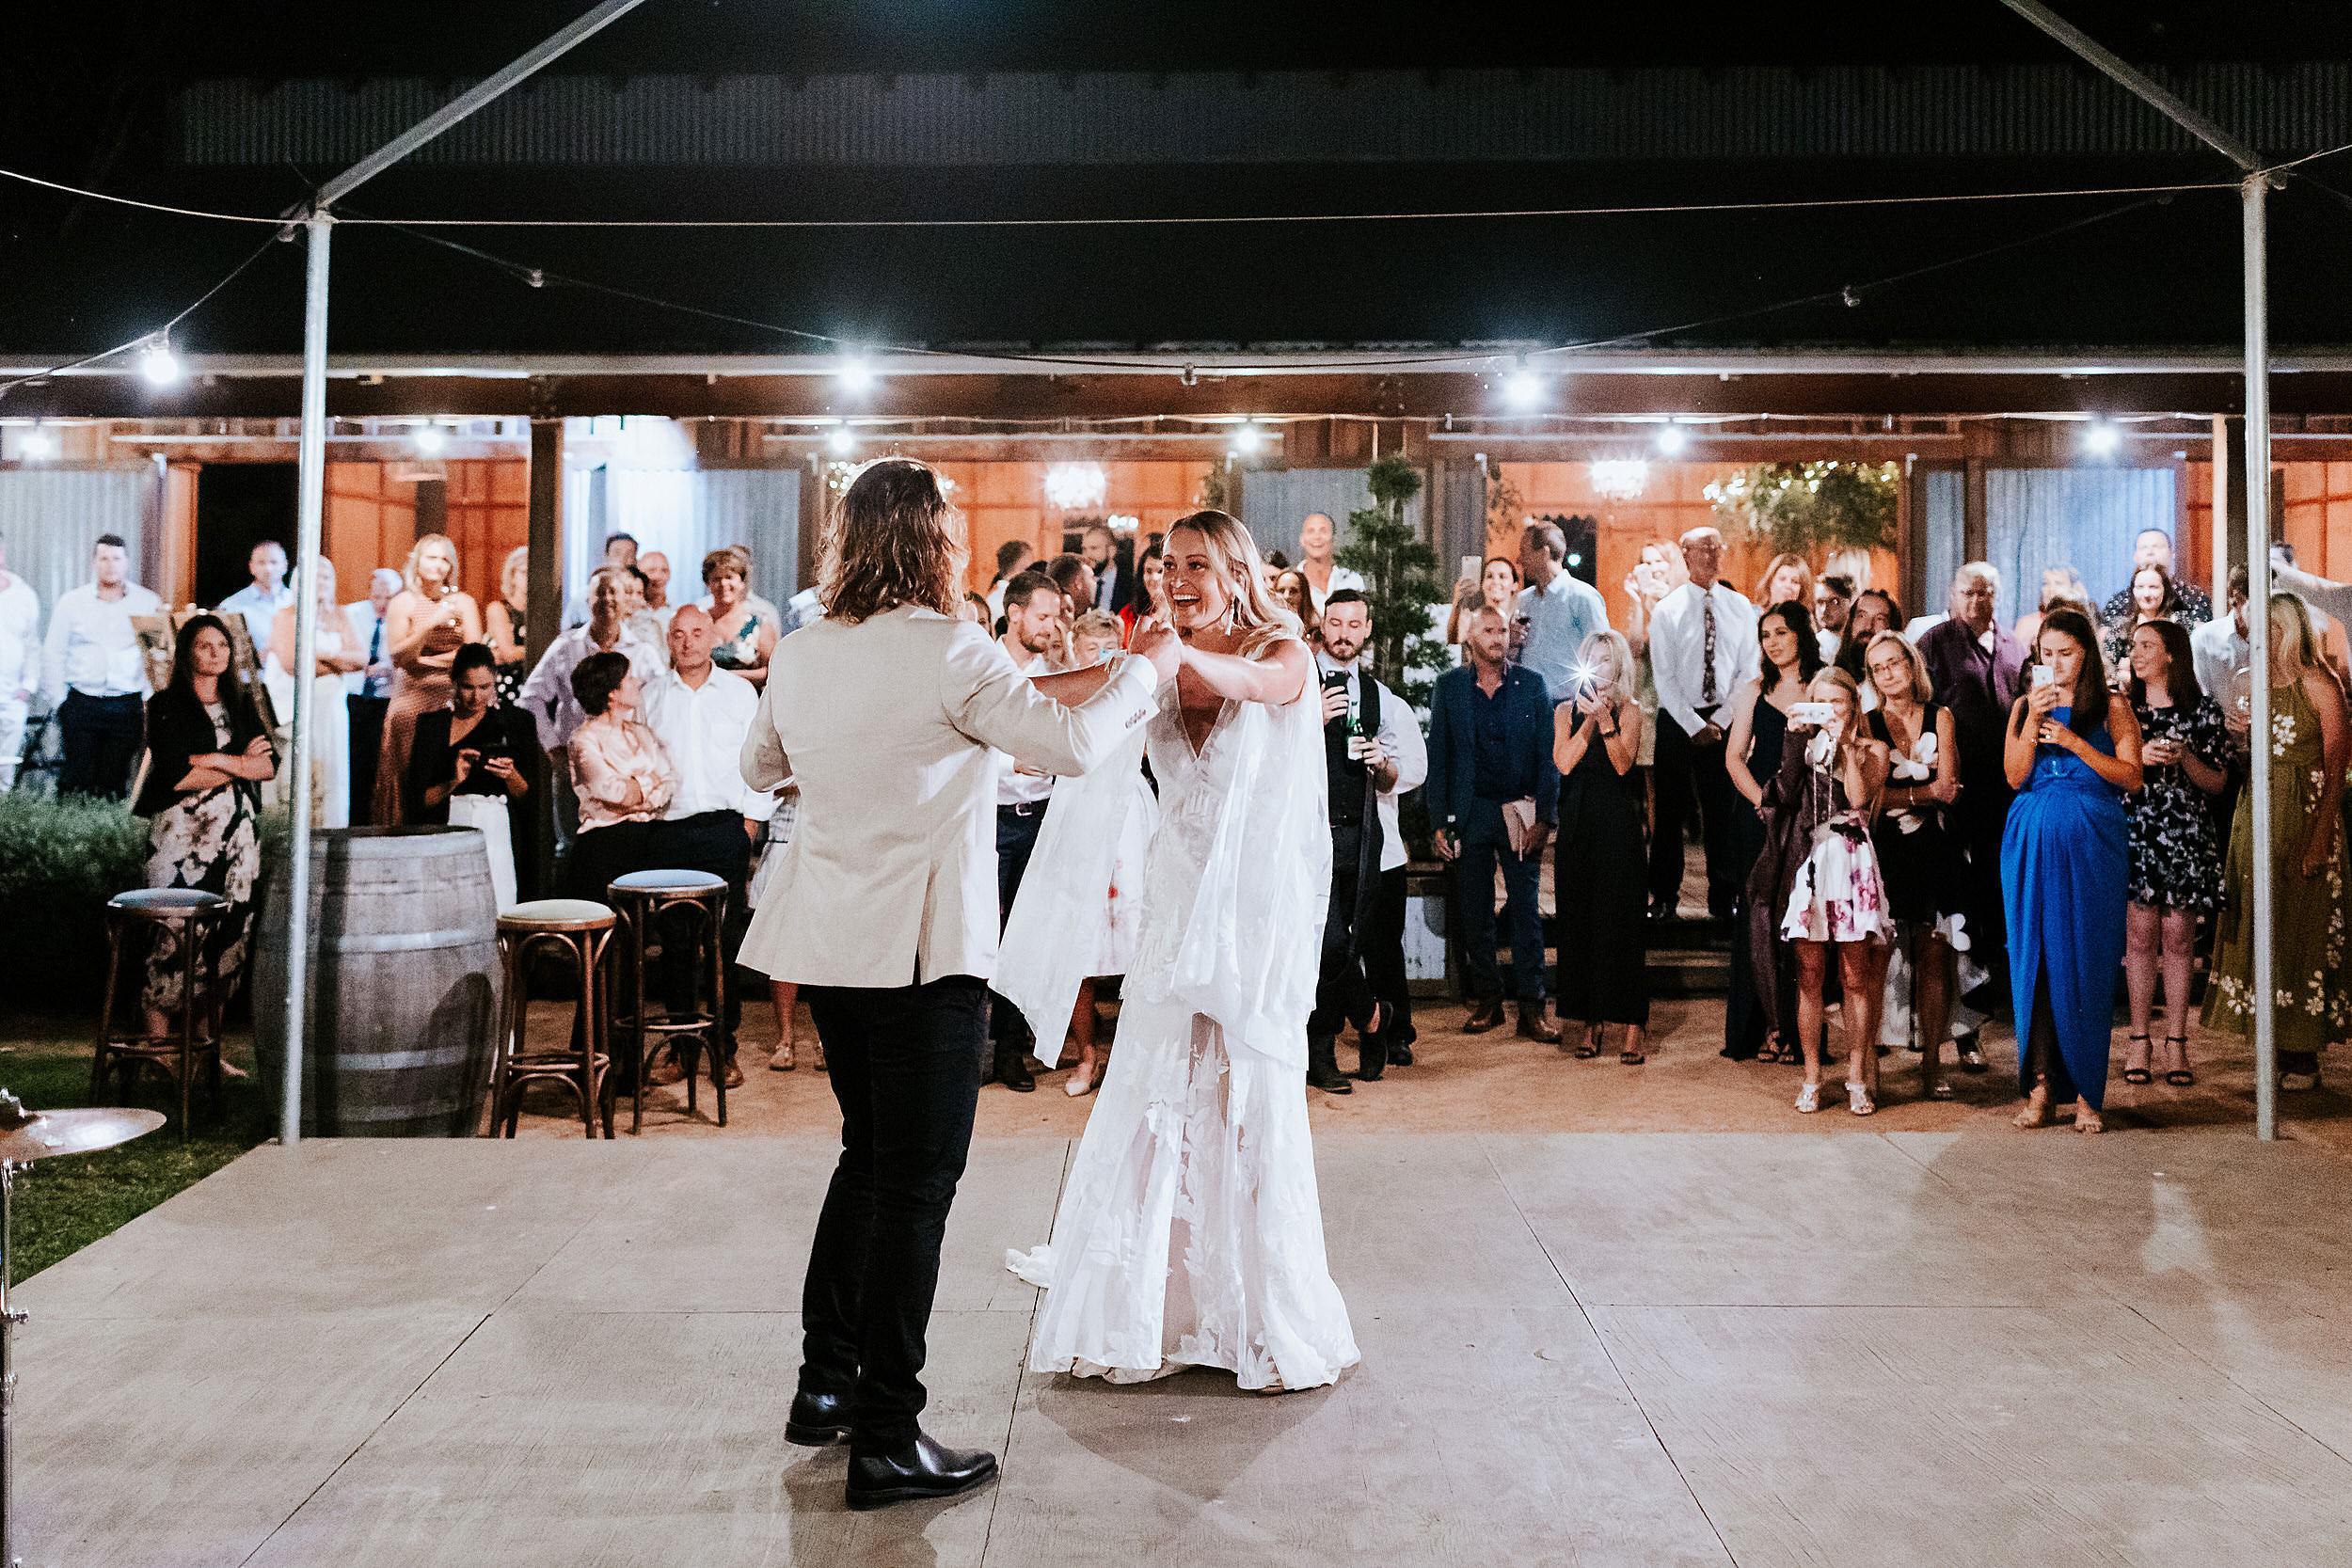 wedding_the_woolshed_steph_zac_0199.jpg